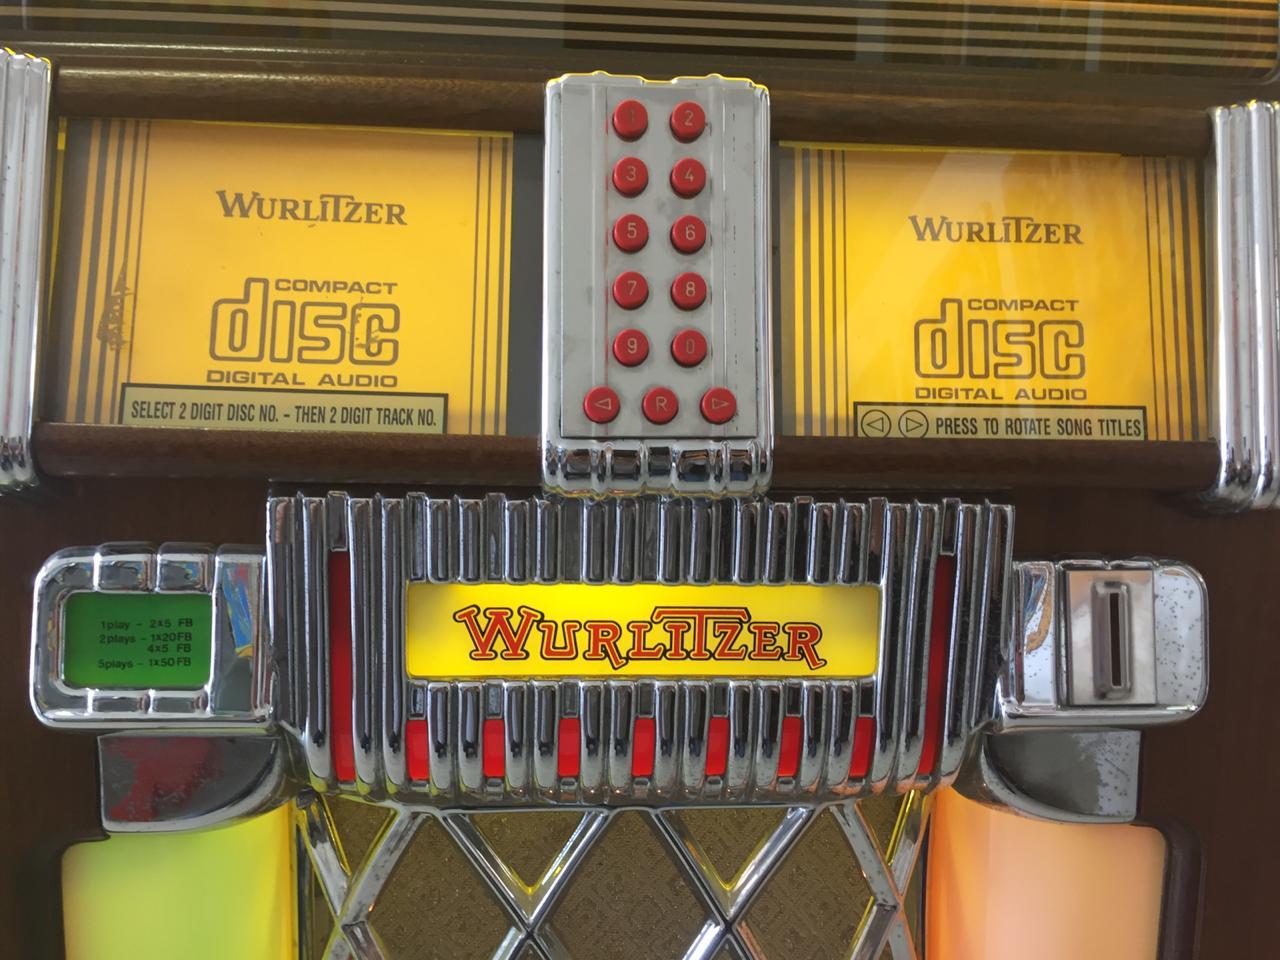 Wurlitzer Model 1015 CD Jukebox Walnut Model for sale in perfect condition